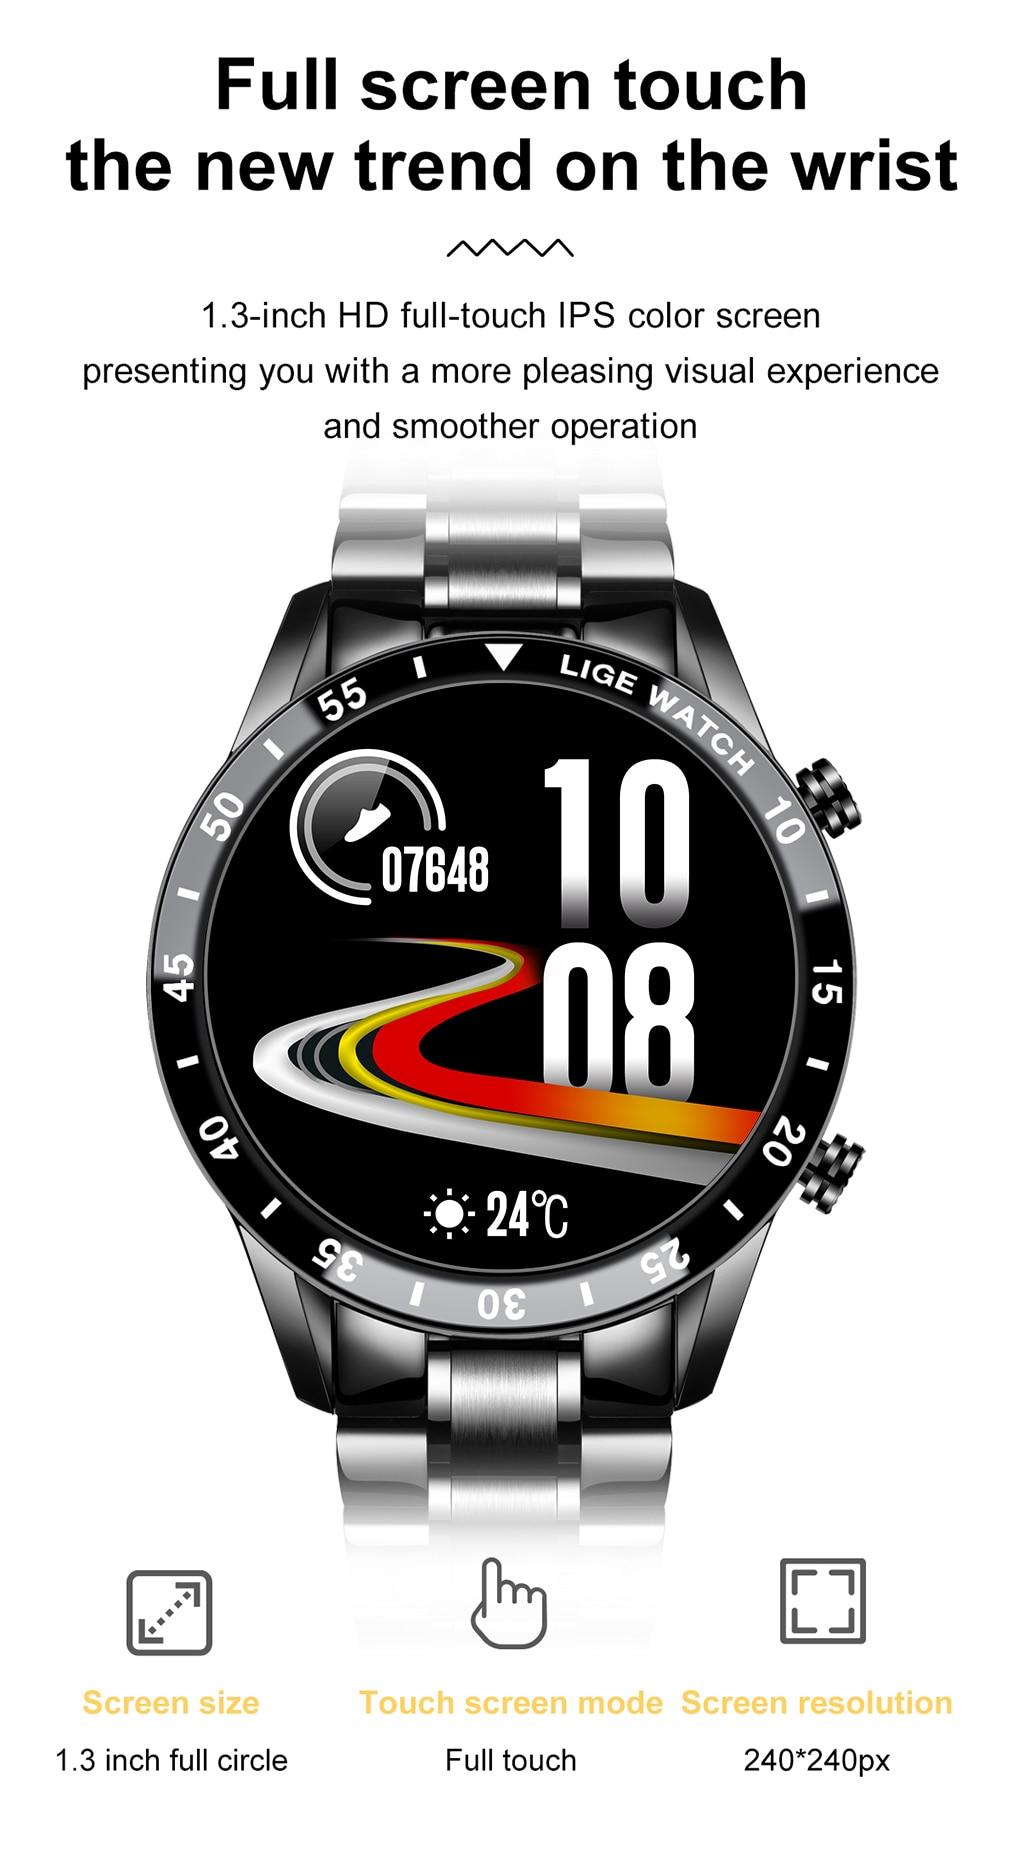 Hdca61a6264484d828c283ba631f7d198K LIGE 2021 Full circle touch screen steel Band luxury Bluetooth call Men smart watch Waterproof Sport Activity fitness watch+box